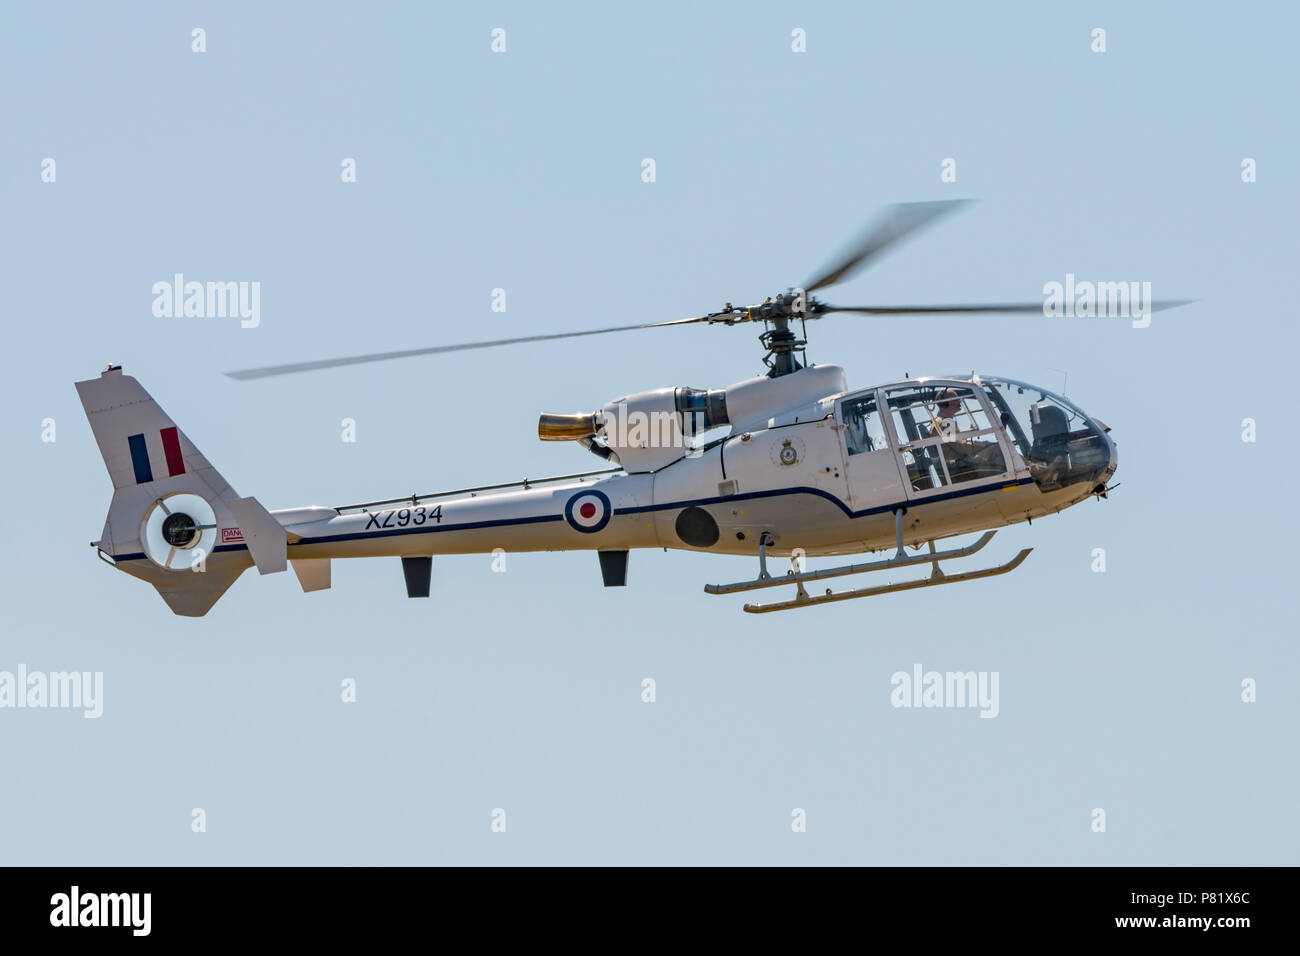 Gazelle Geschwader Hubschrauber im Flying Display an RNAS Yeovilton International Air Tag, UK am 7. Juli 2018. Stockfoto